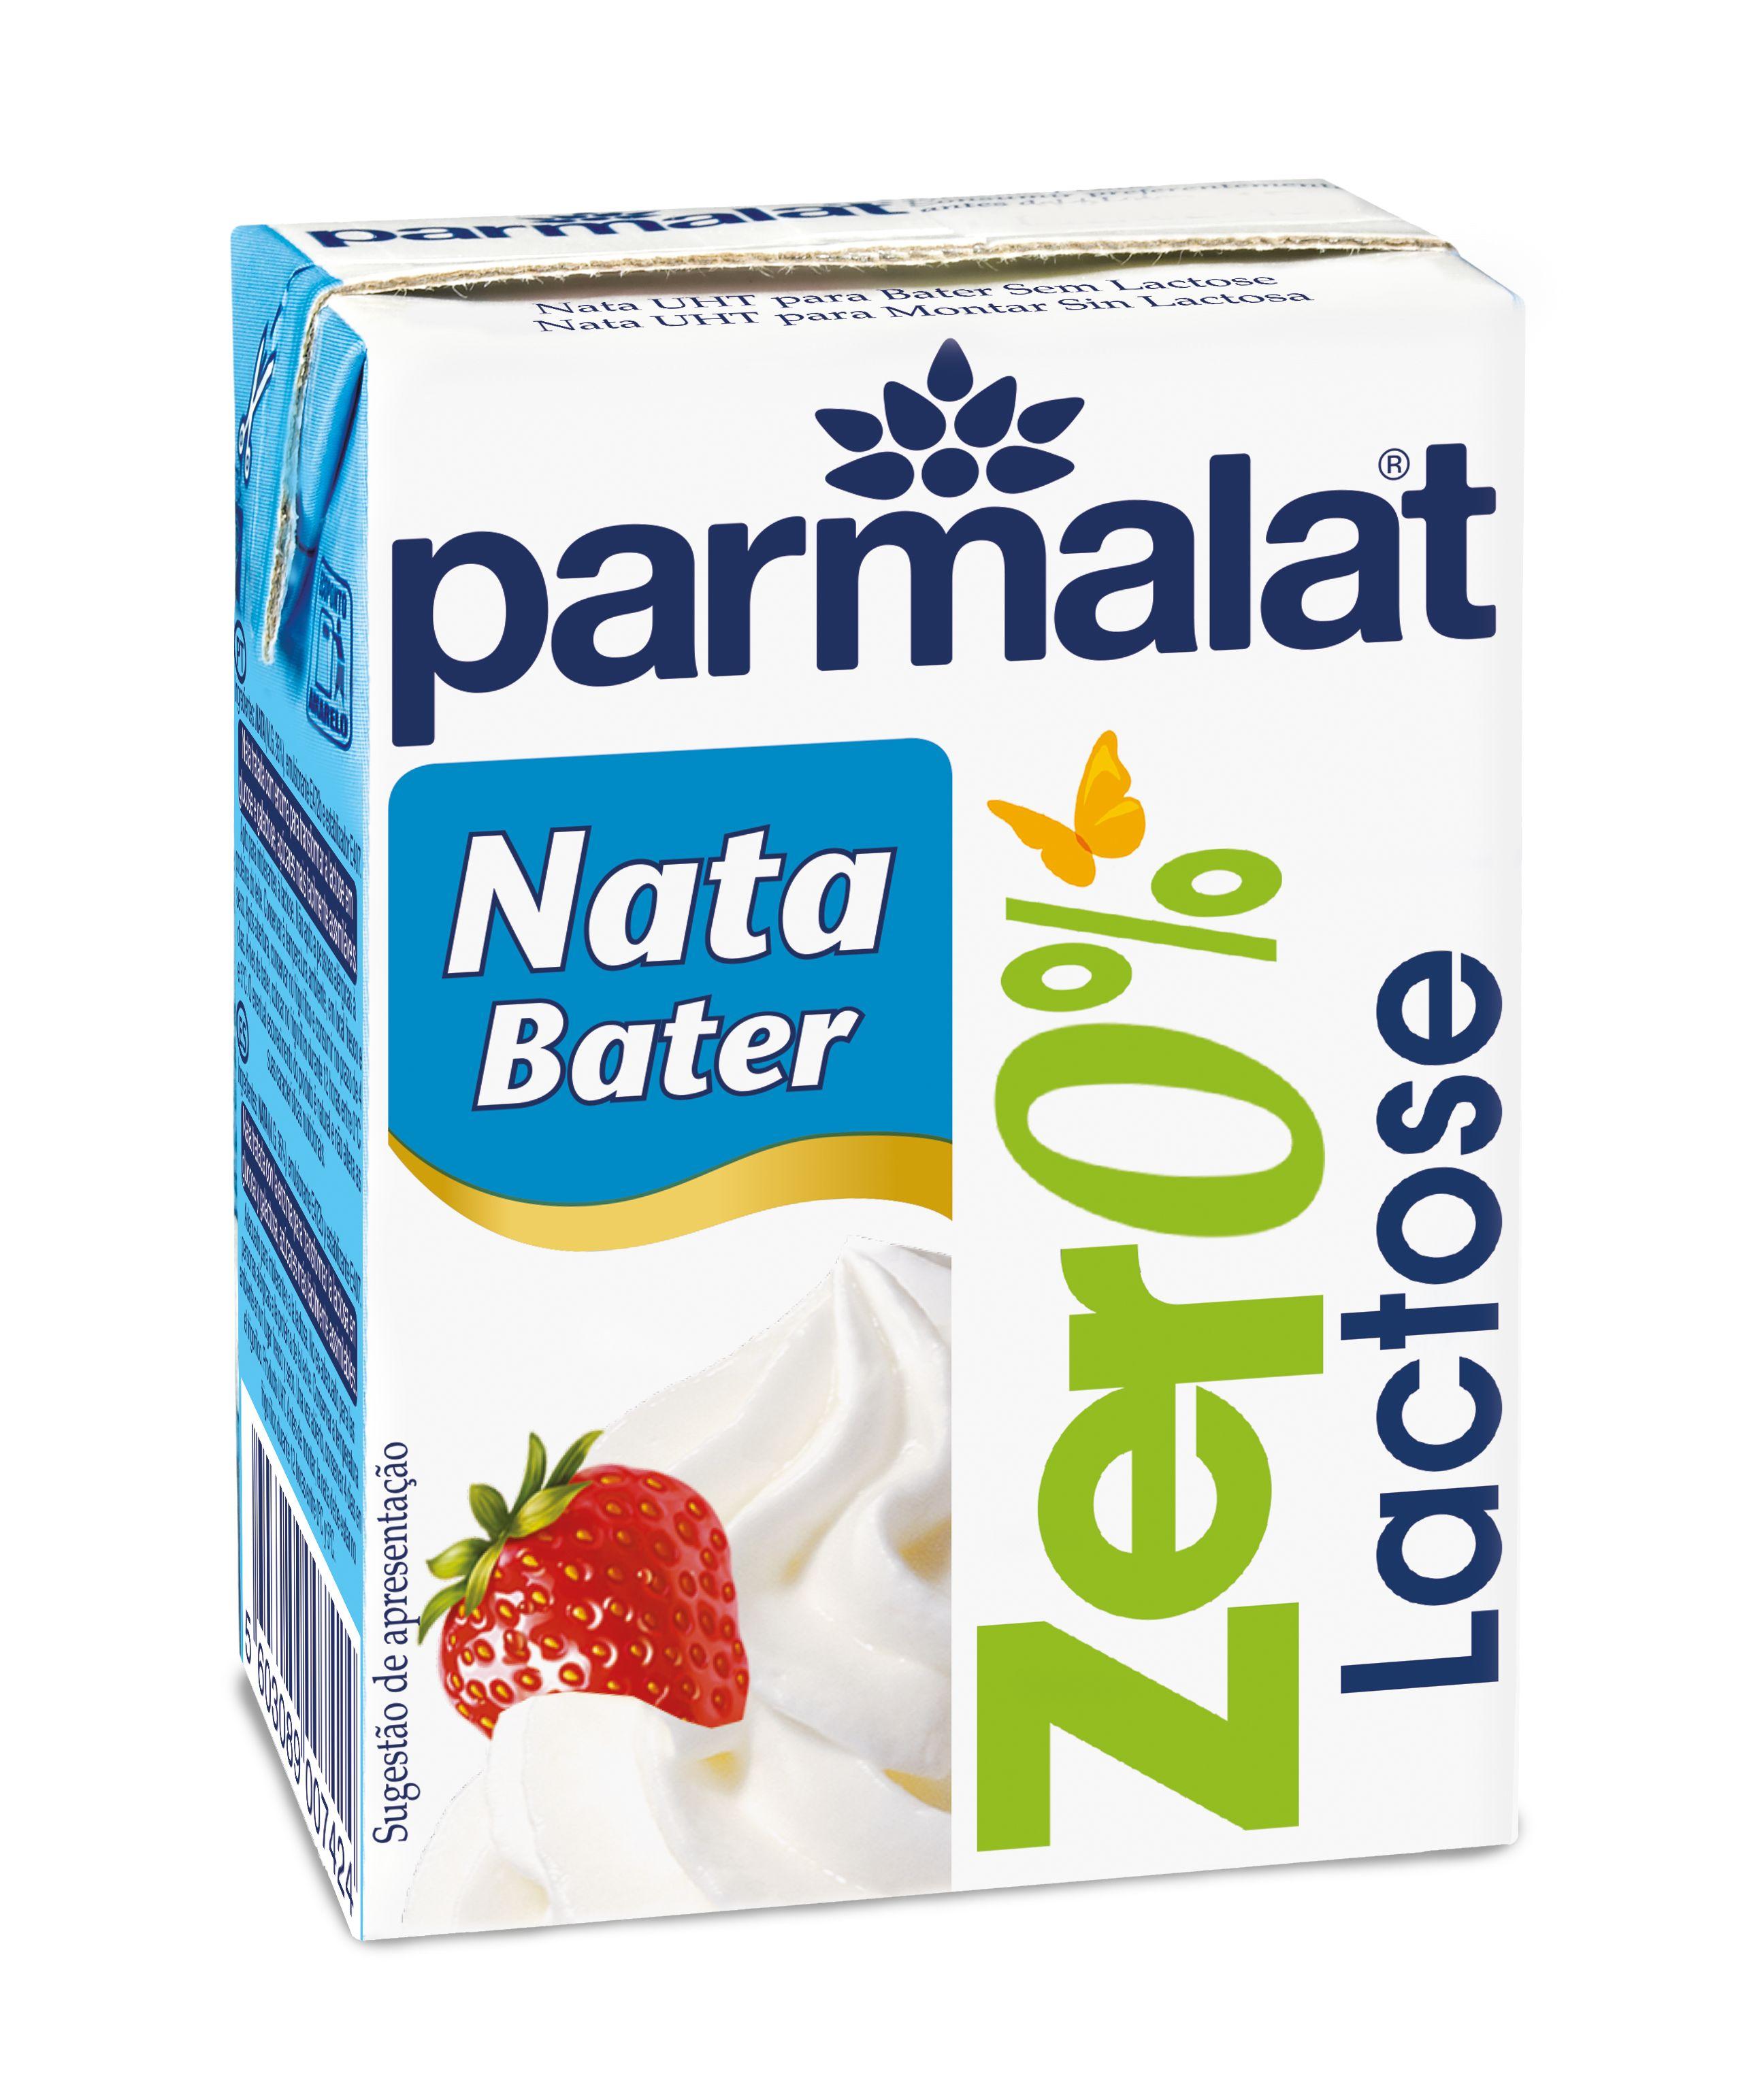 Nata Uht S/Lact Parmalat P/Bater 200Ml